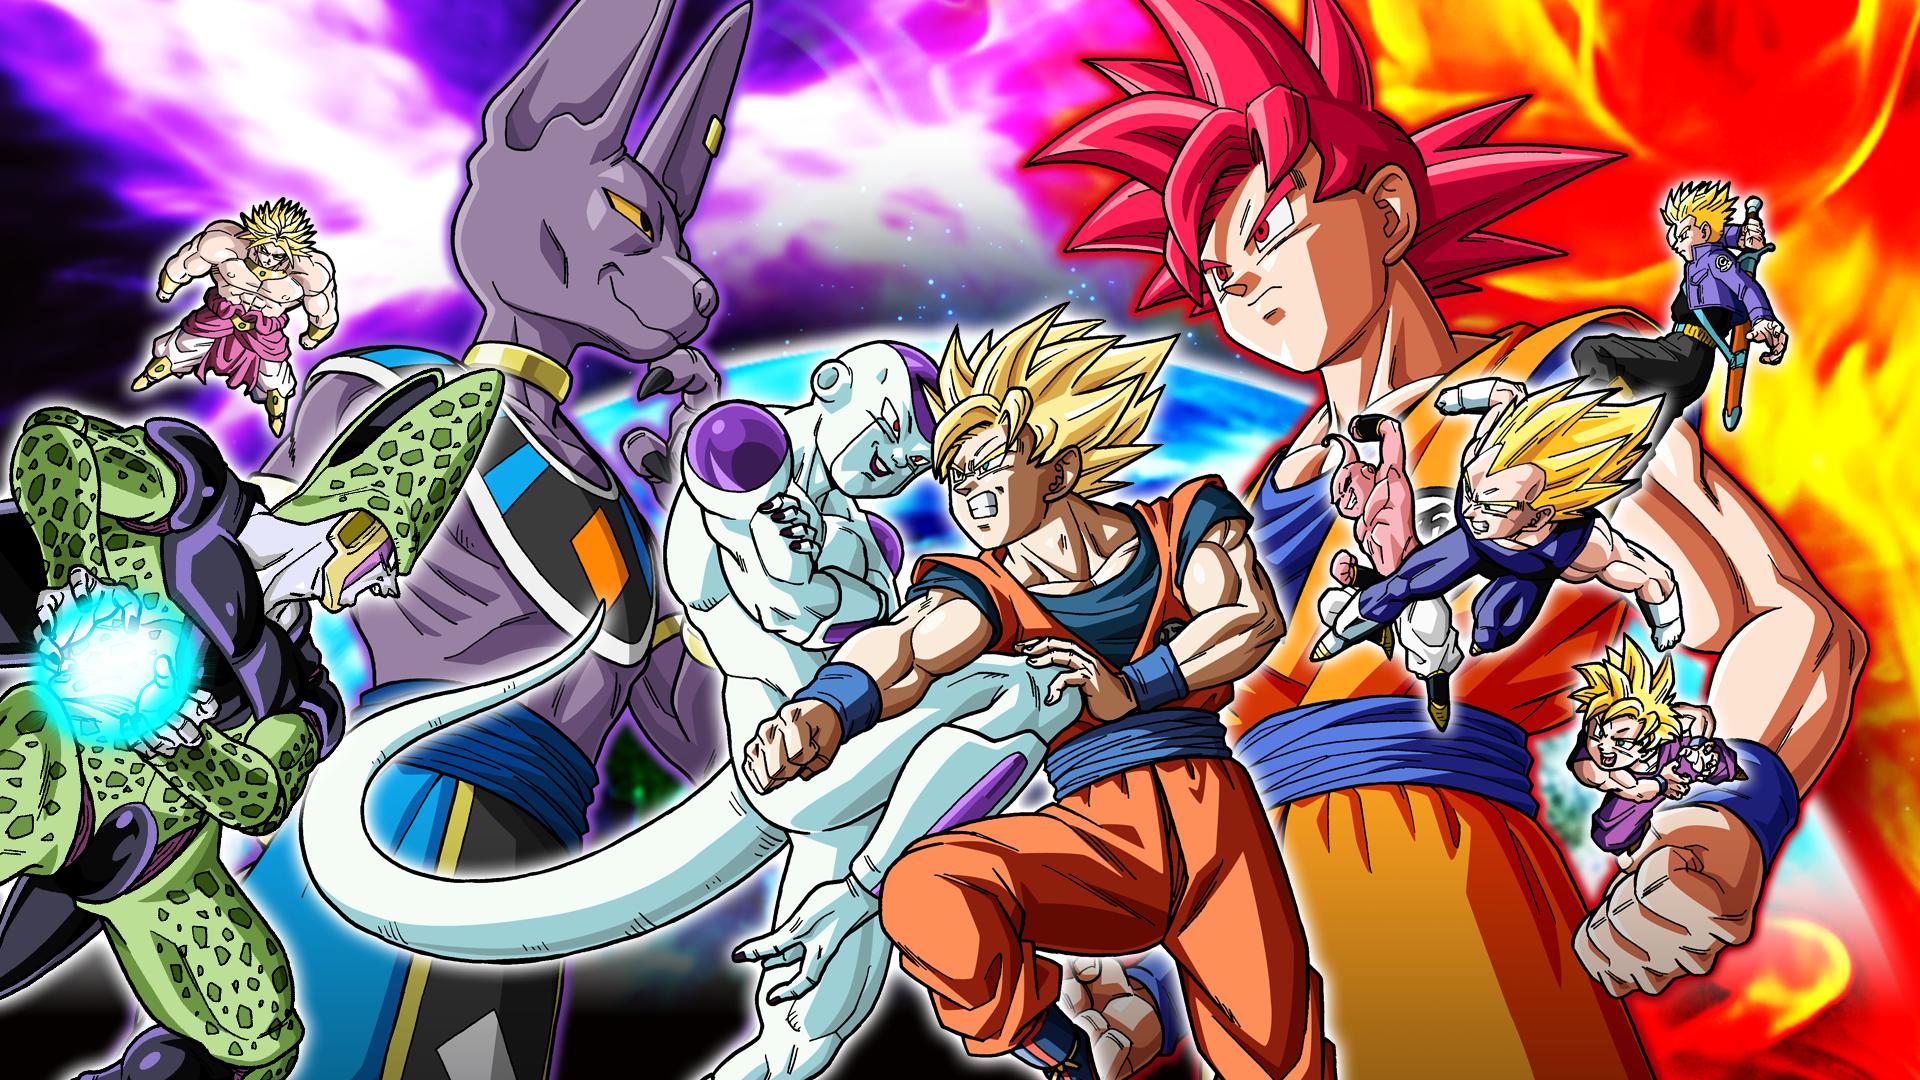 Dragon Ball Z: Battle of Z Details - LaunchBox Games Database